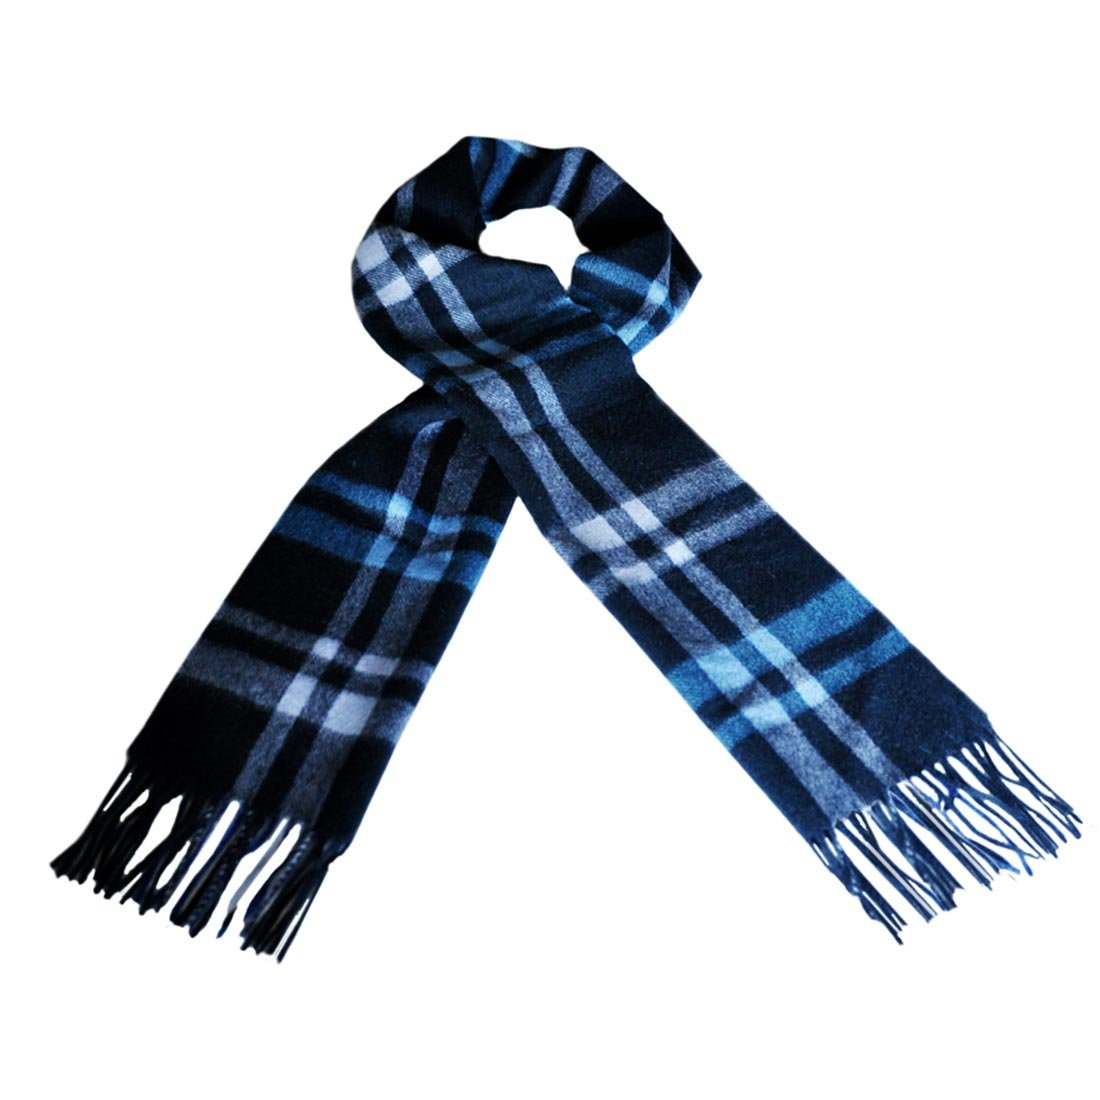 Carrolls Irish Designs Wool Scarf With Blue, Navy & Grey Design 12